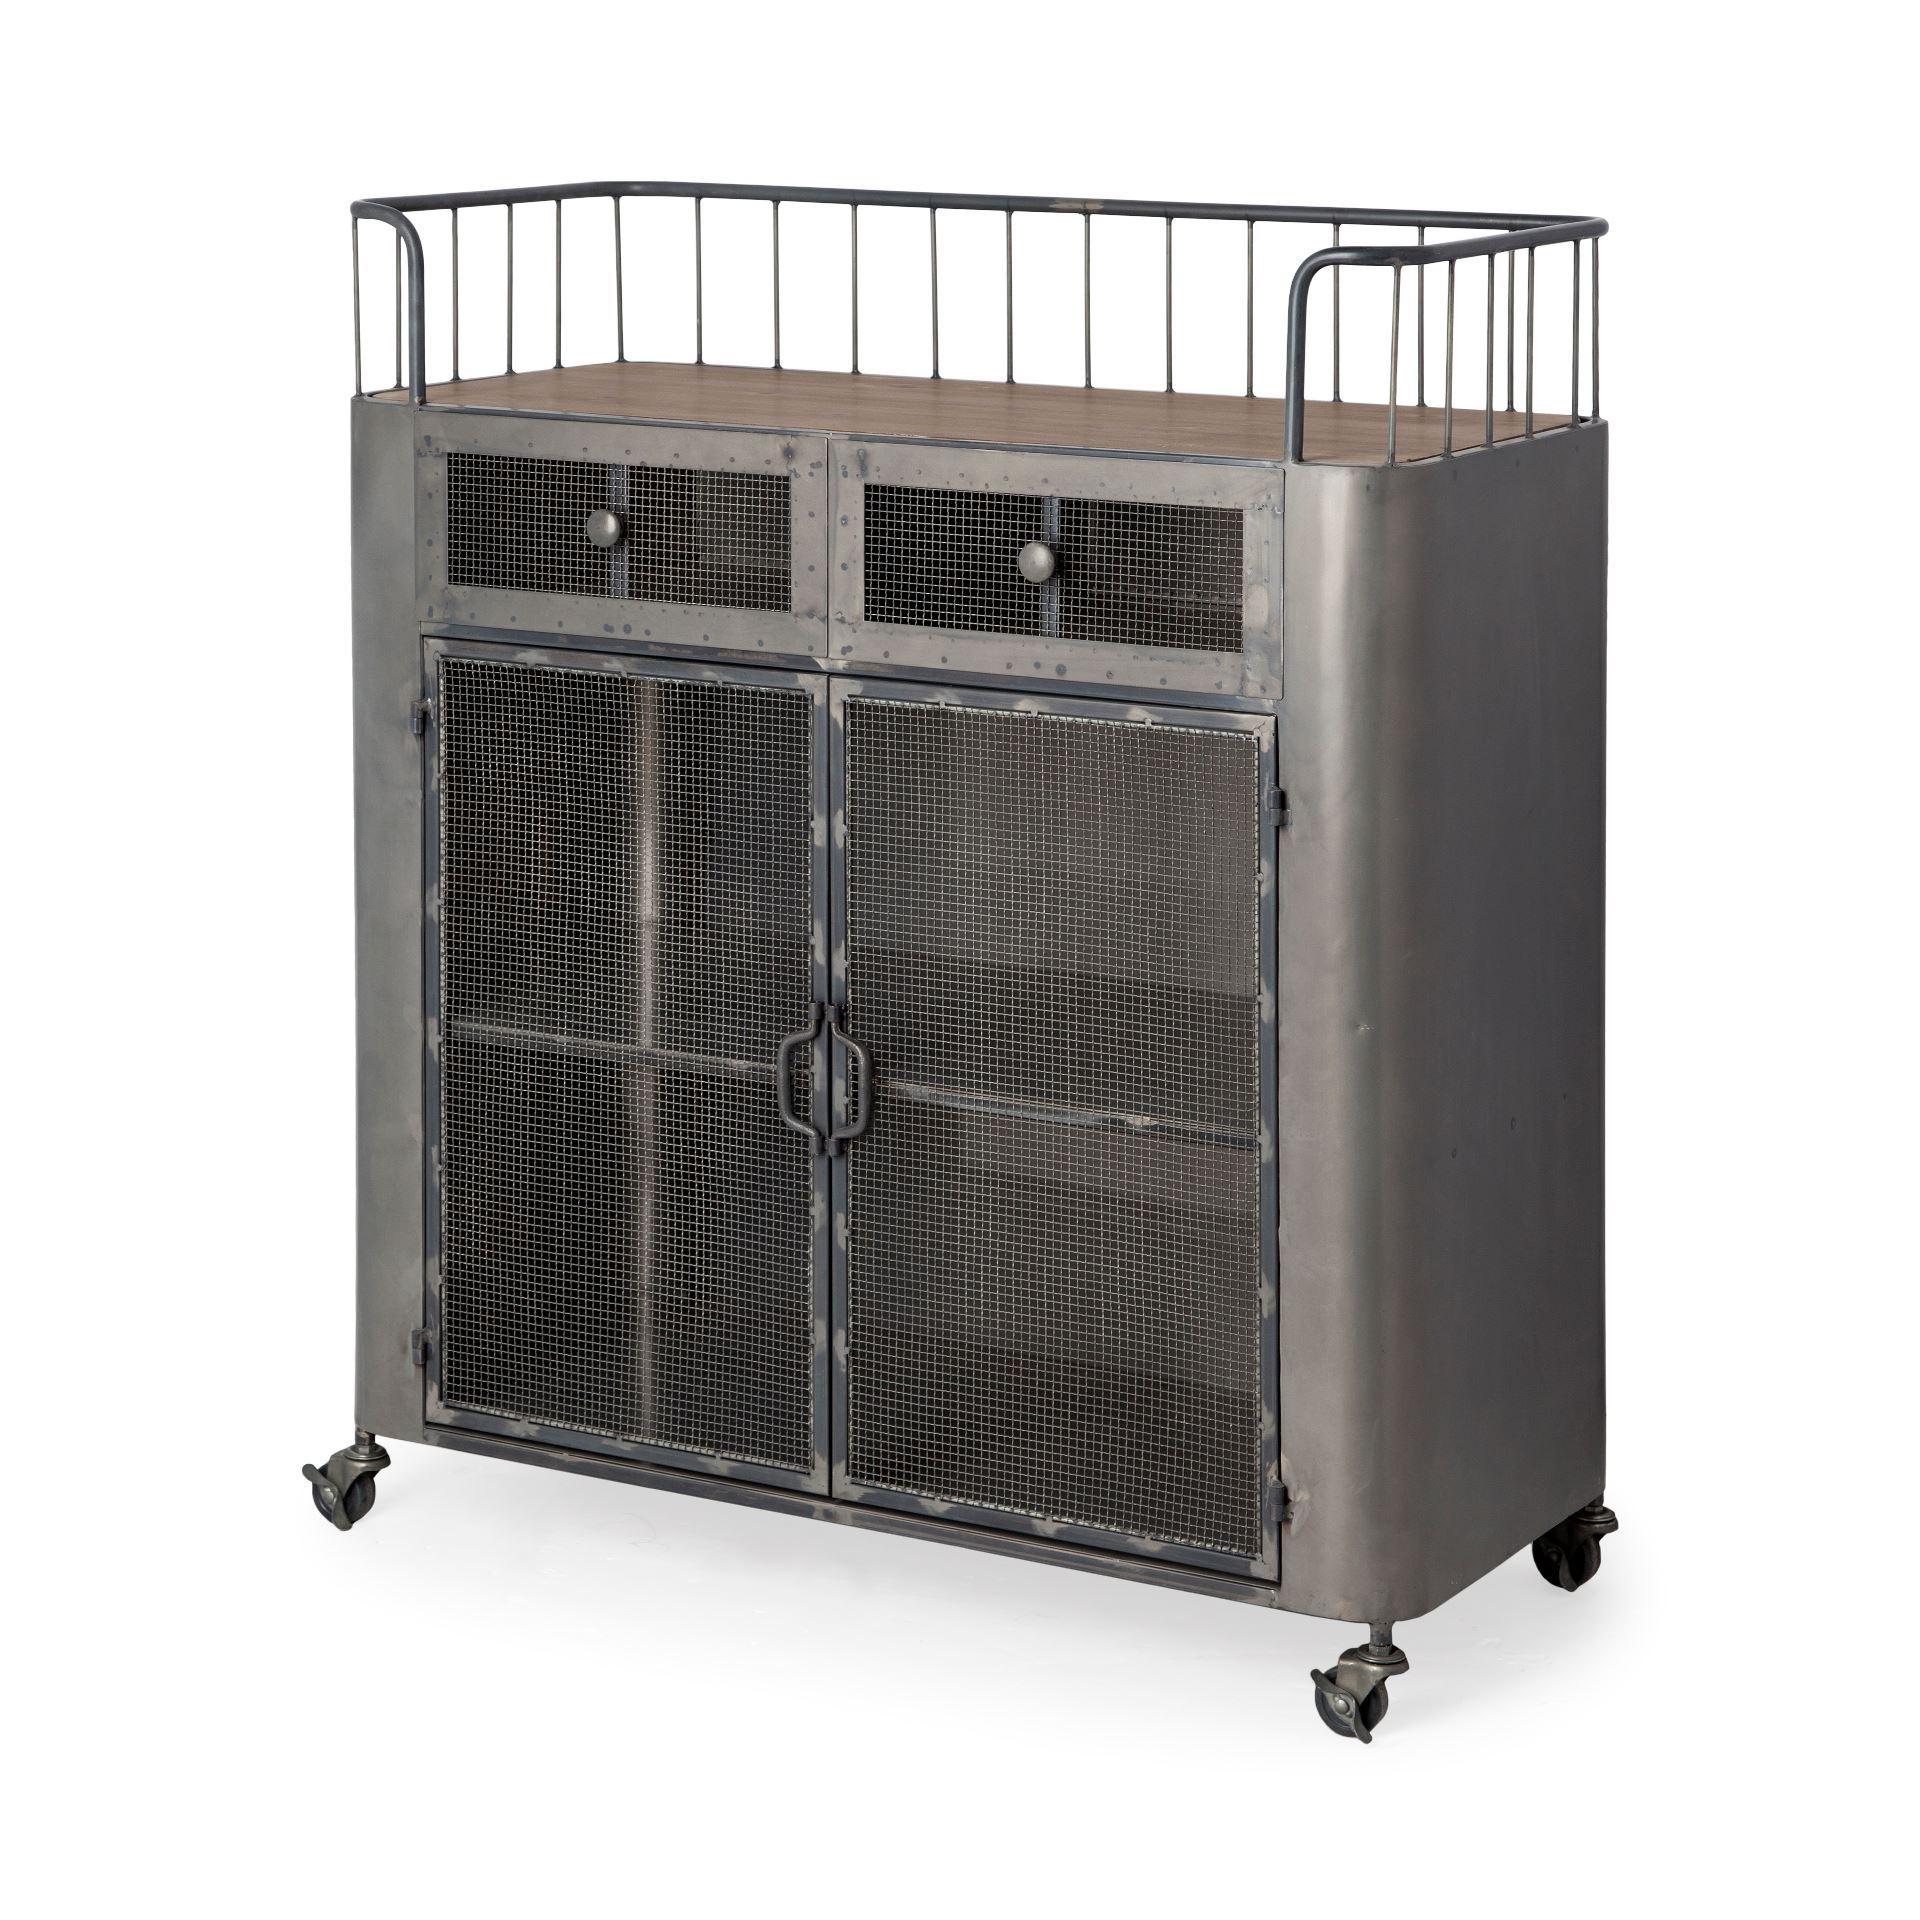 Rectangular Rustic Metal With Metal Door/Wood Top And Two Shelves Bar Cart